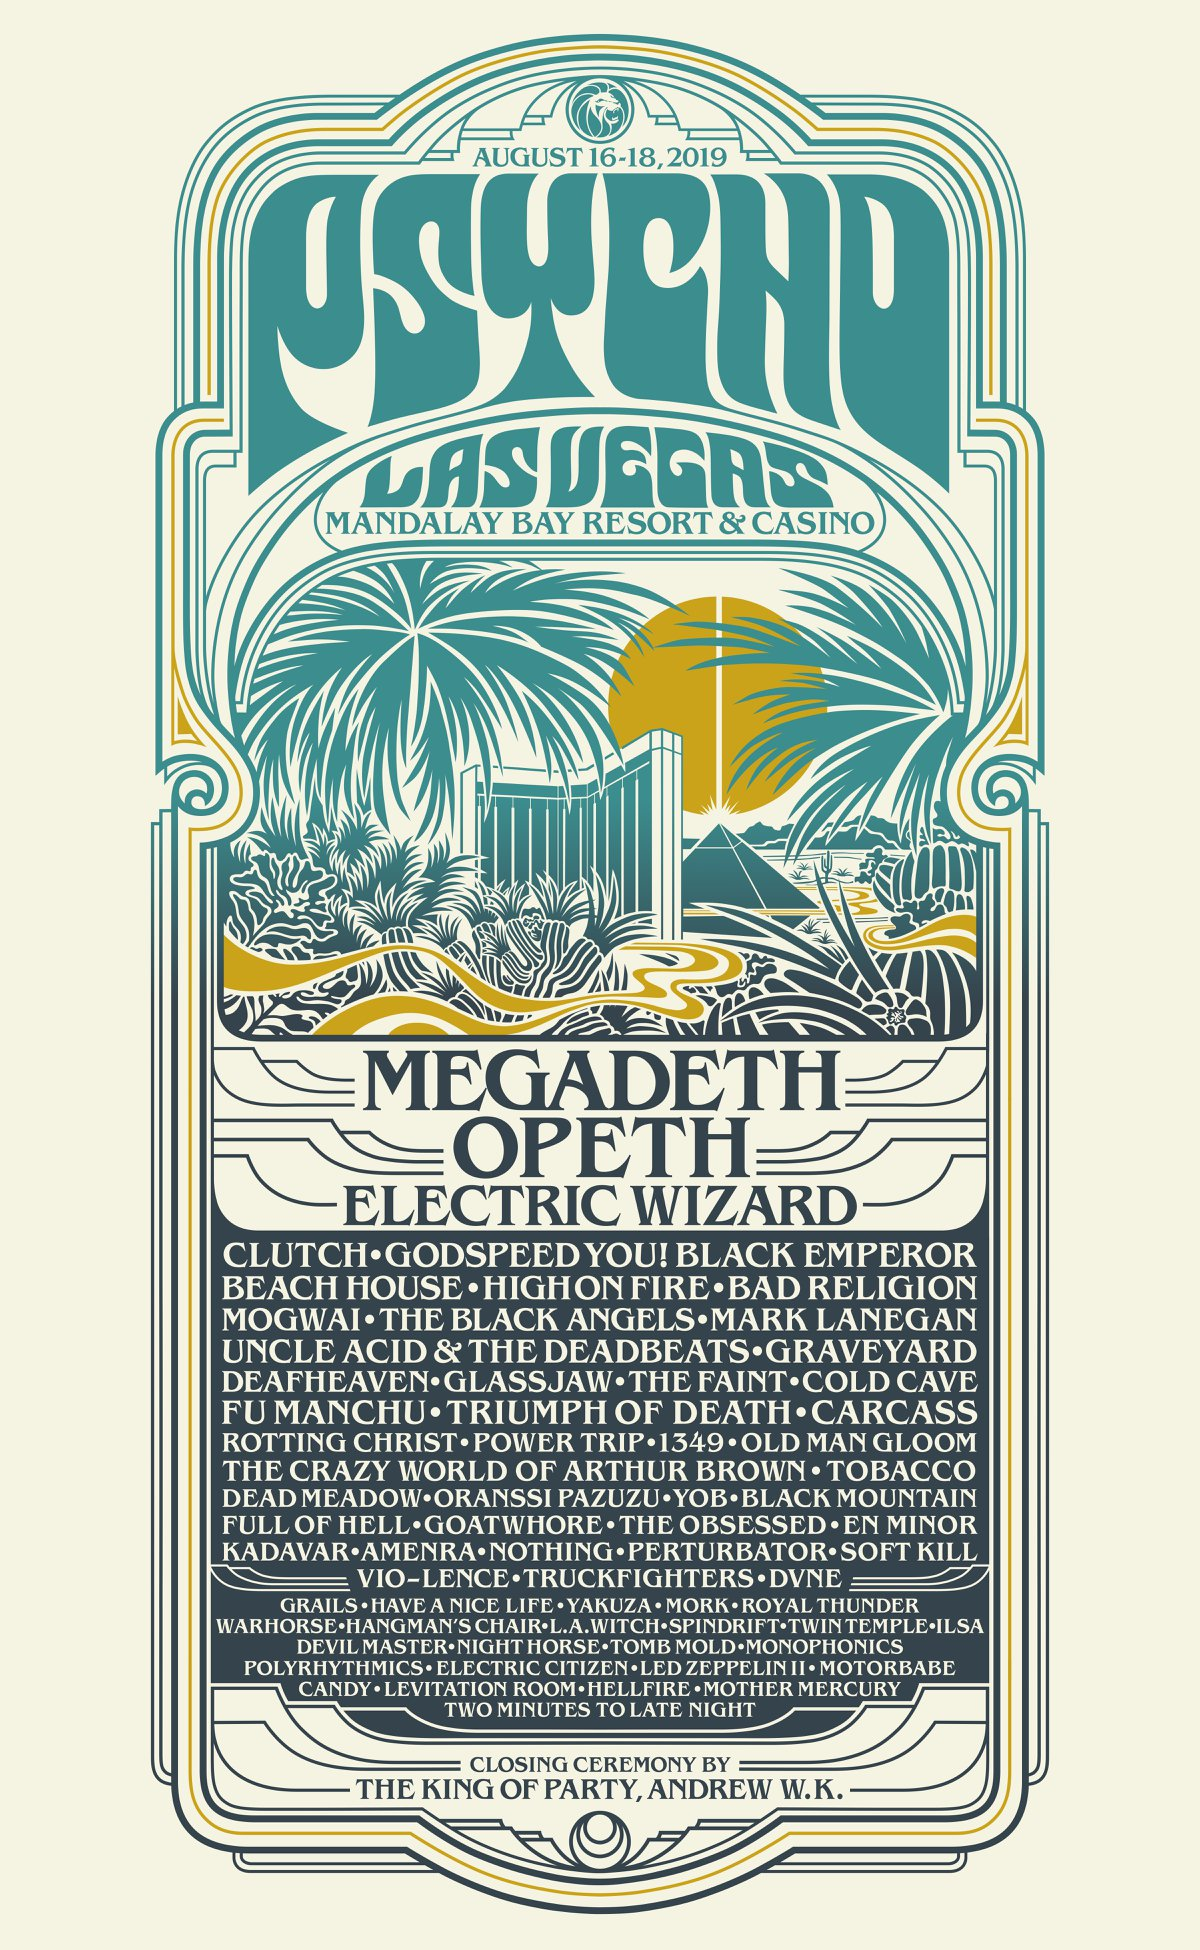 Psycho Las Vegas 2019 Full Lineup poster